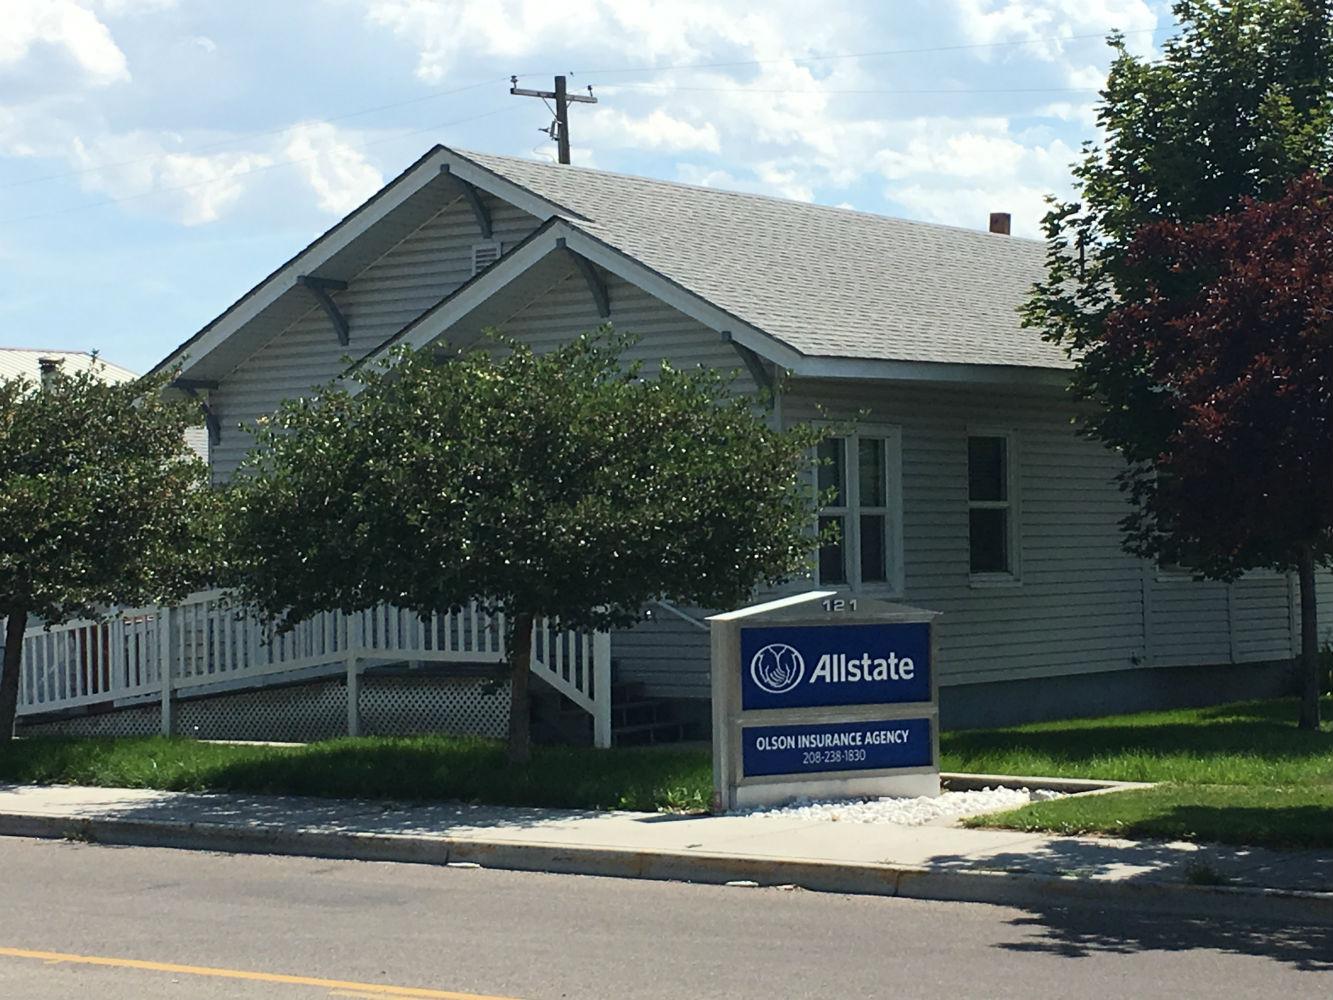 Jonathan Seedall: Allstate Insurance image 1